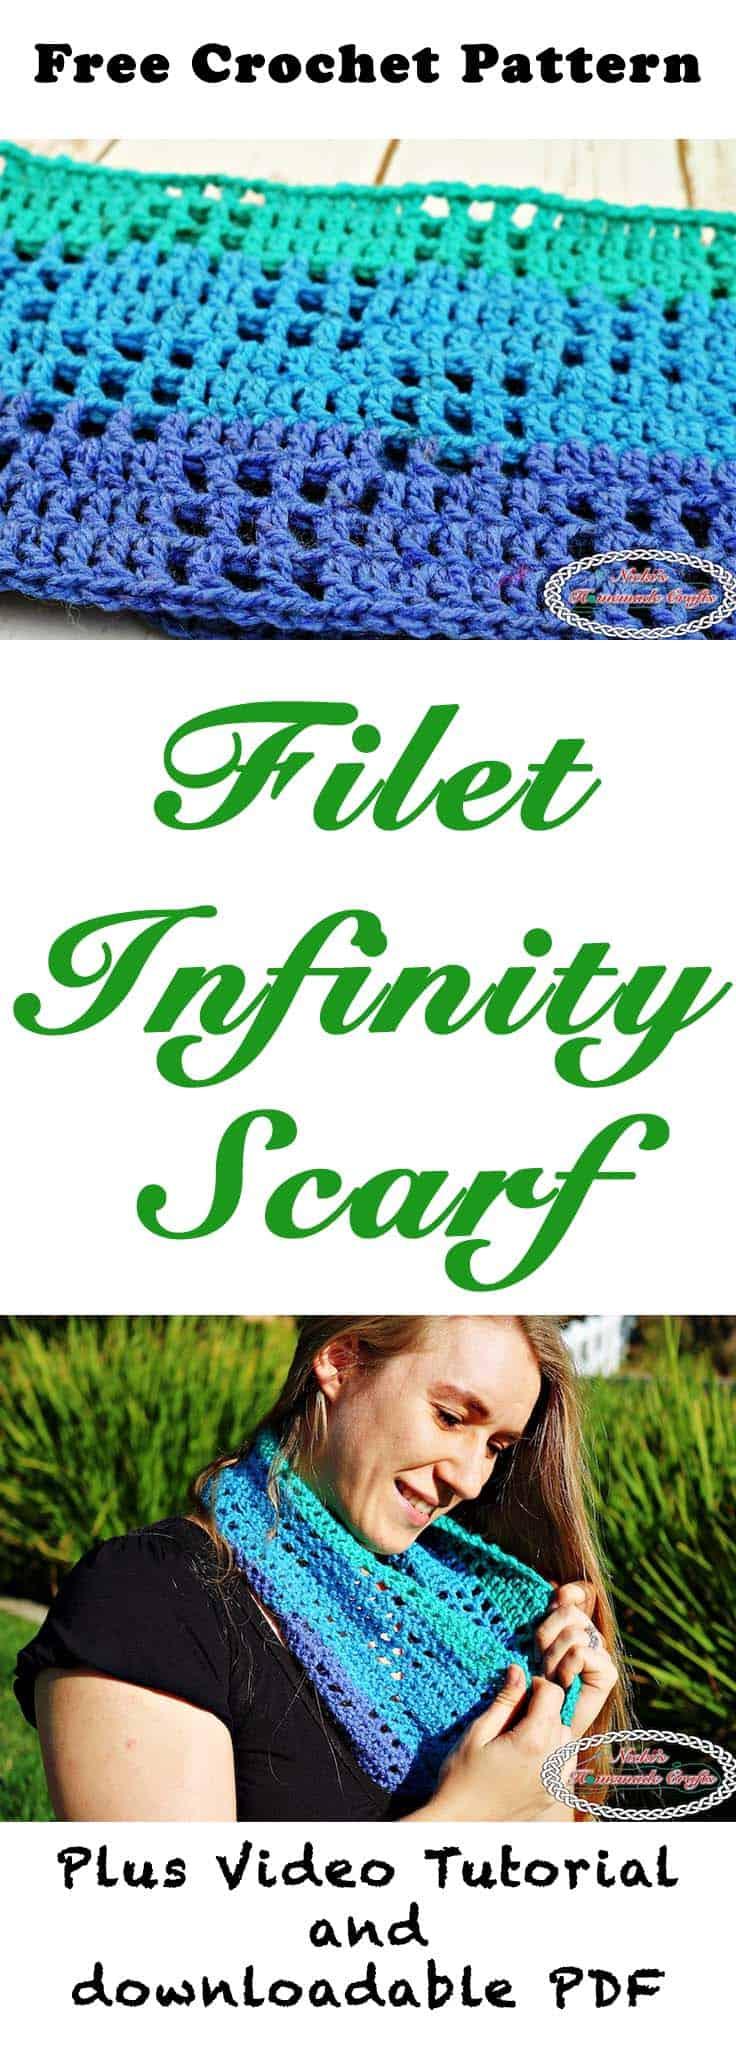 #Filet #Infinity #Scarf - #Free #Crochet #Pattern by Nicki's Homemade Crafts #freecrochetpattern #winter